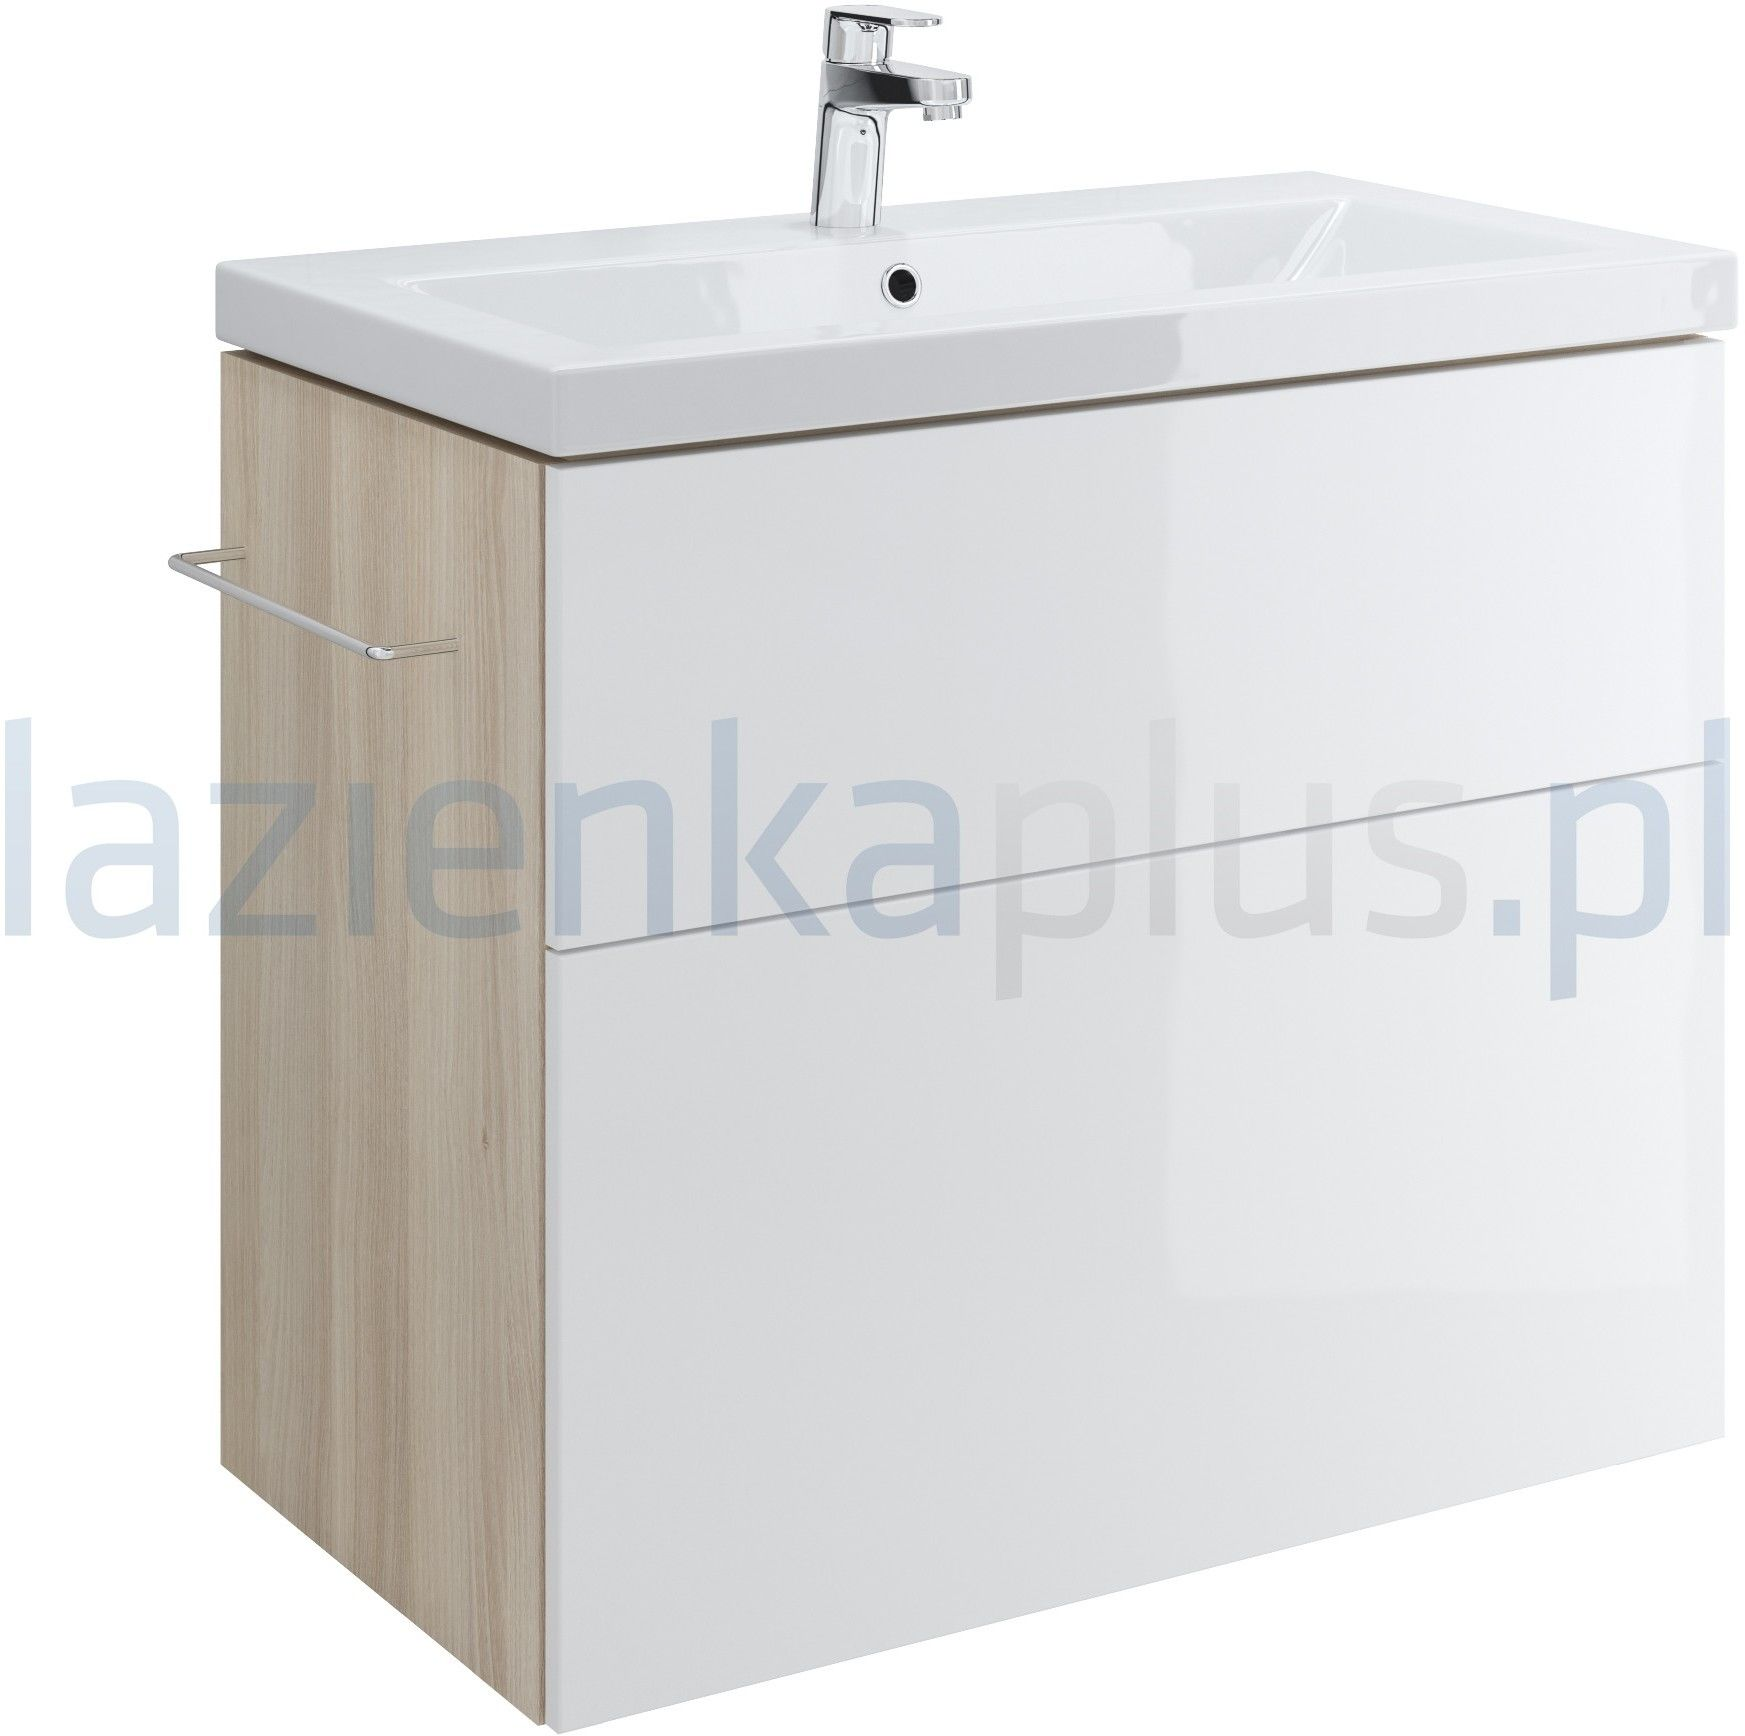 Cersanit Smart 80 cm Szafka pod umywalkę Como biały front S568-020